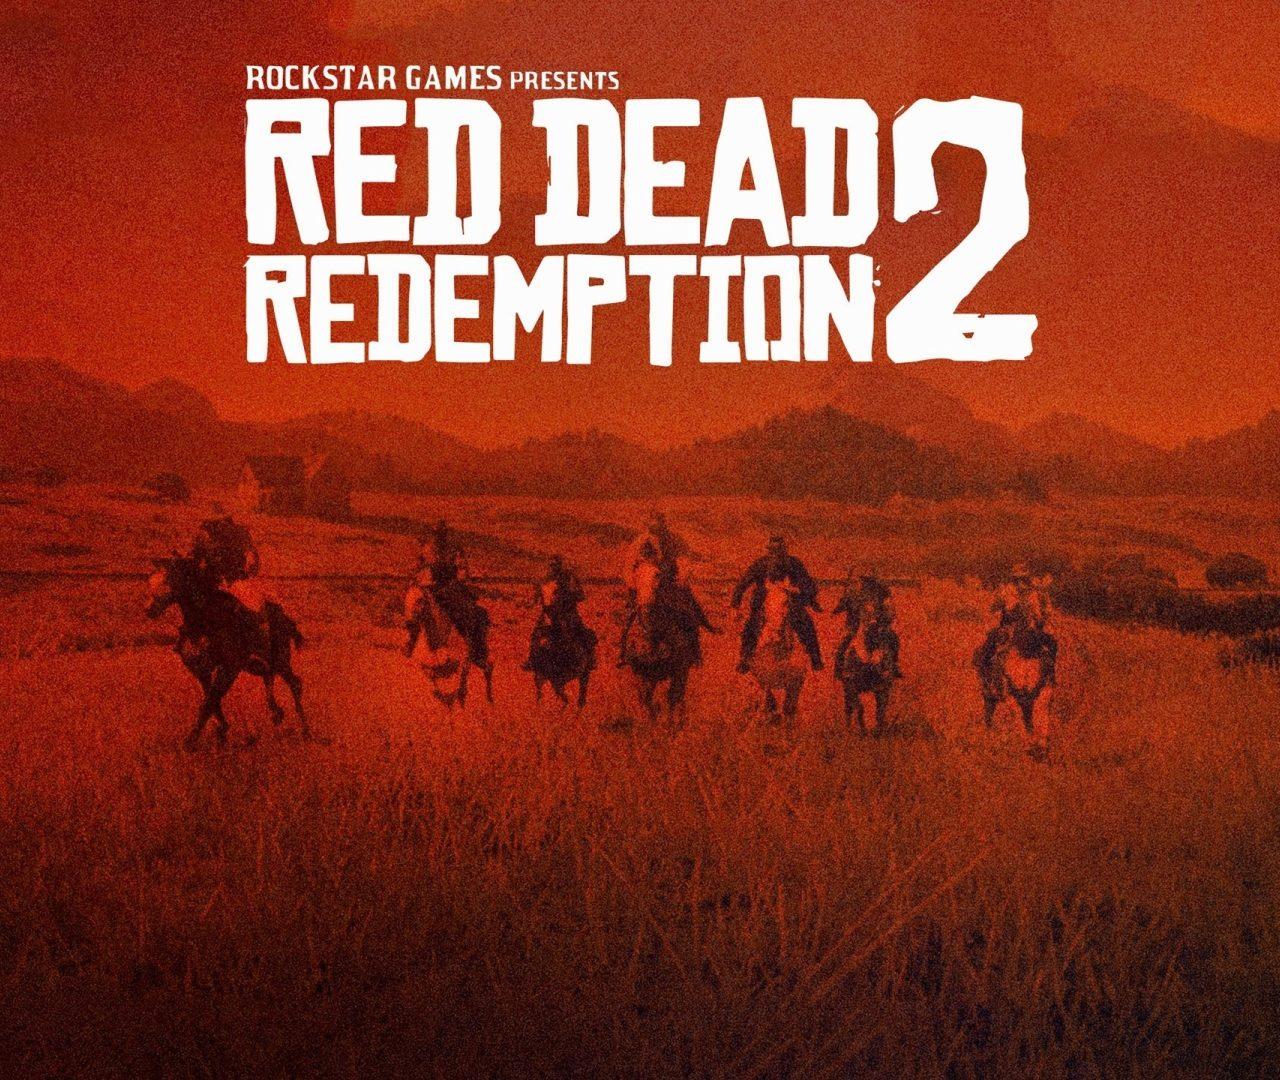 Red Dead Redemption 2 Desktop Wallpapers 3 Computer Background